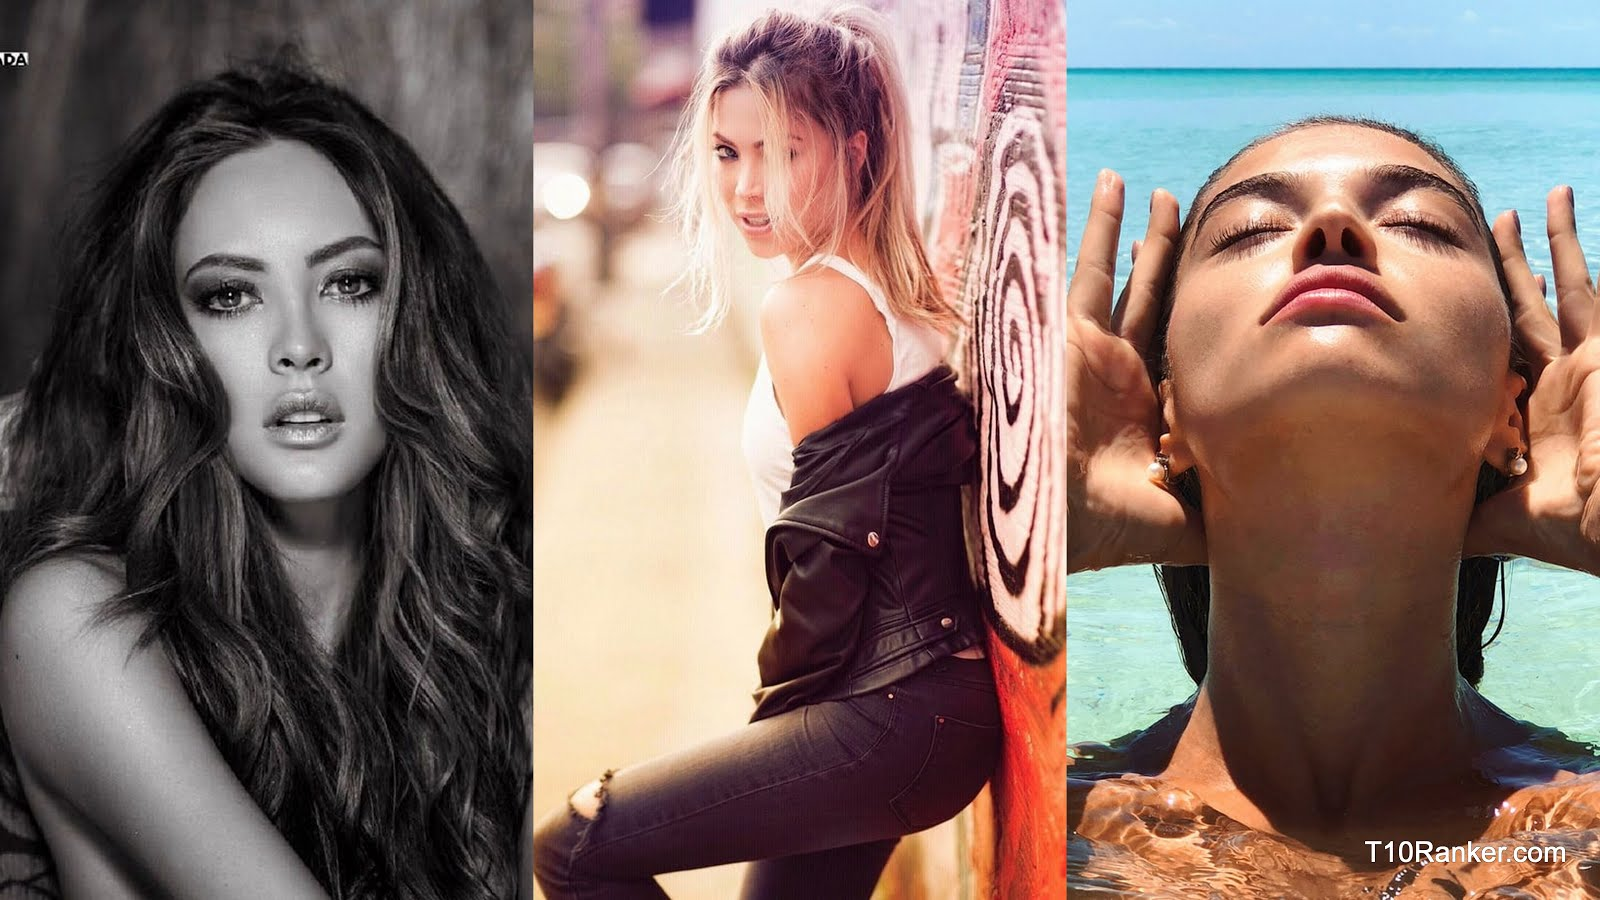 Top 10 hottest models